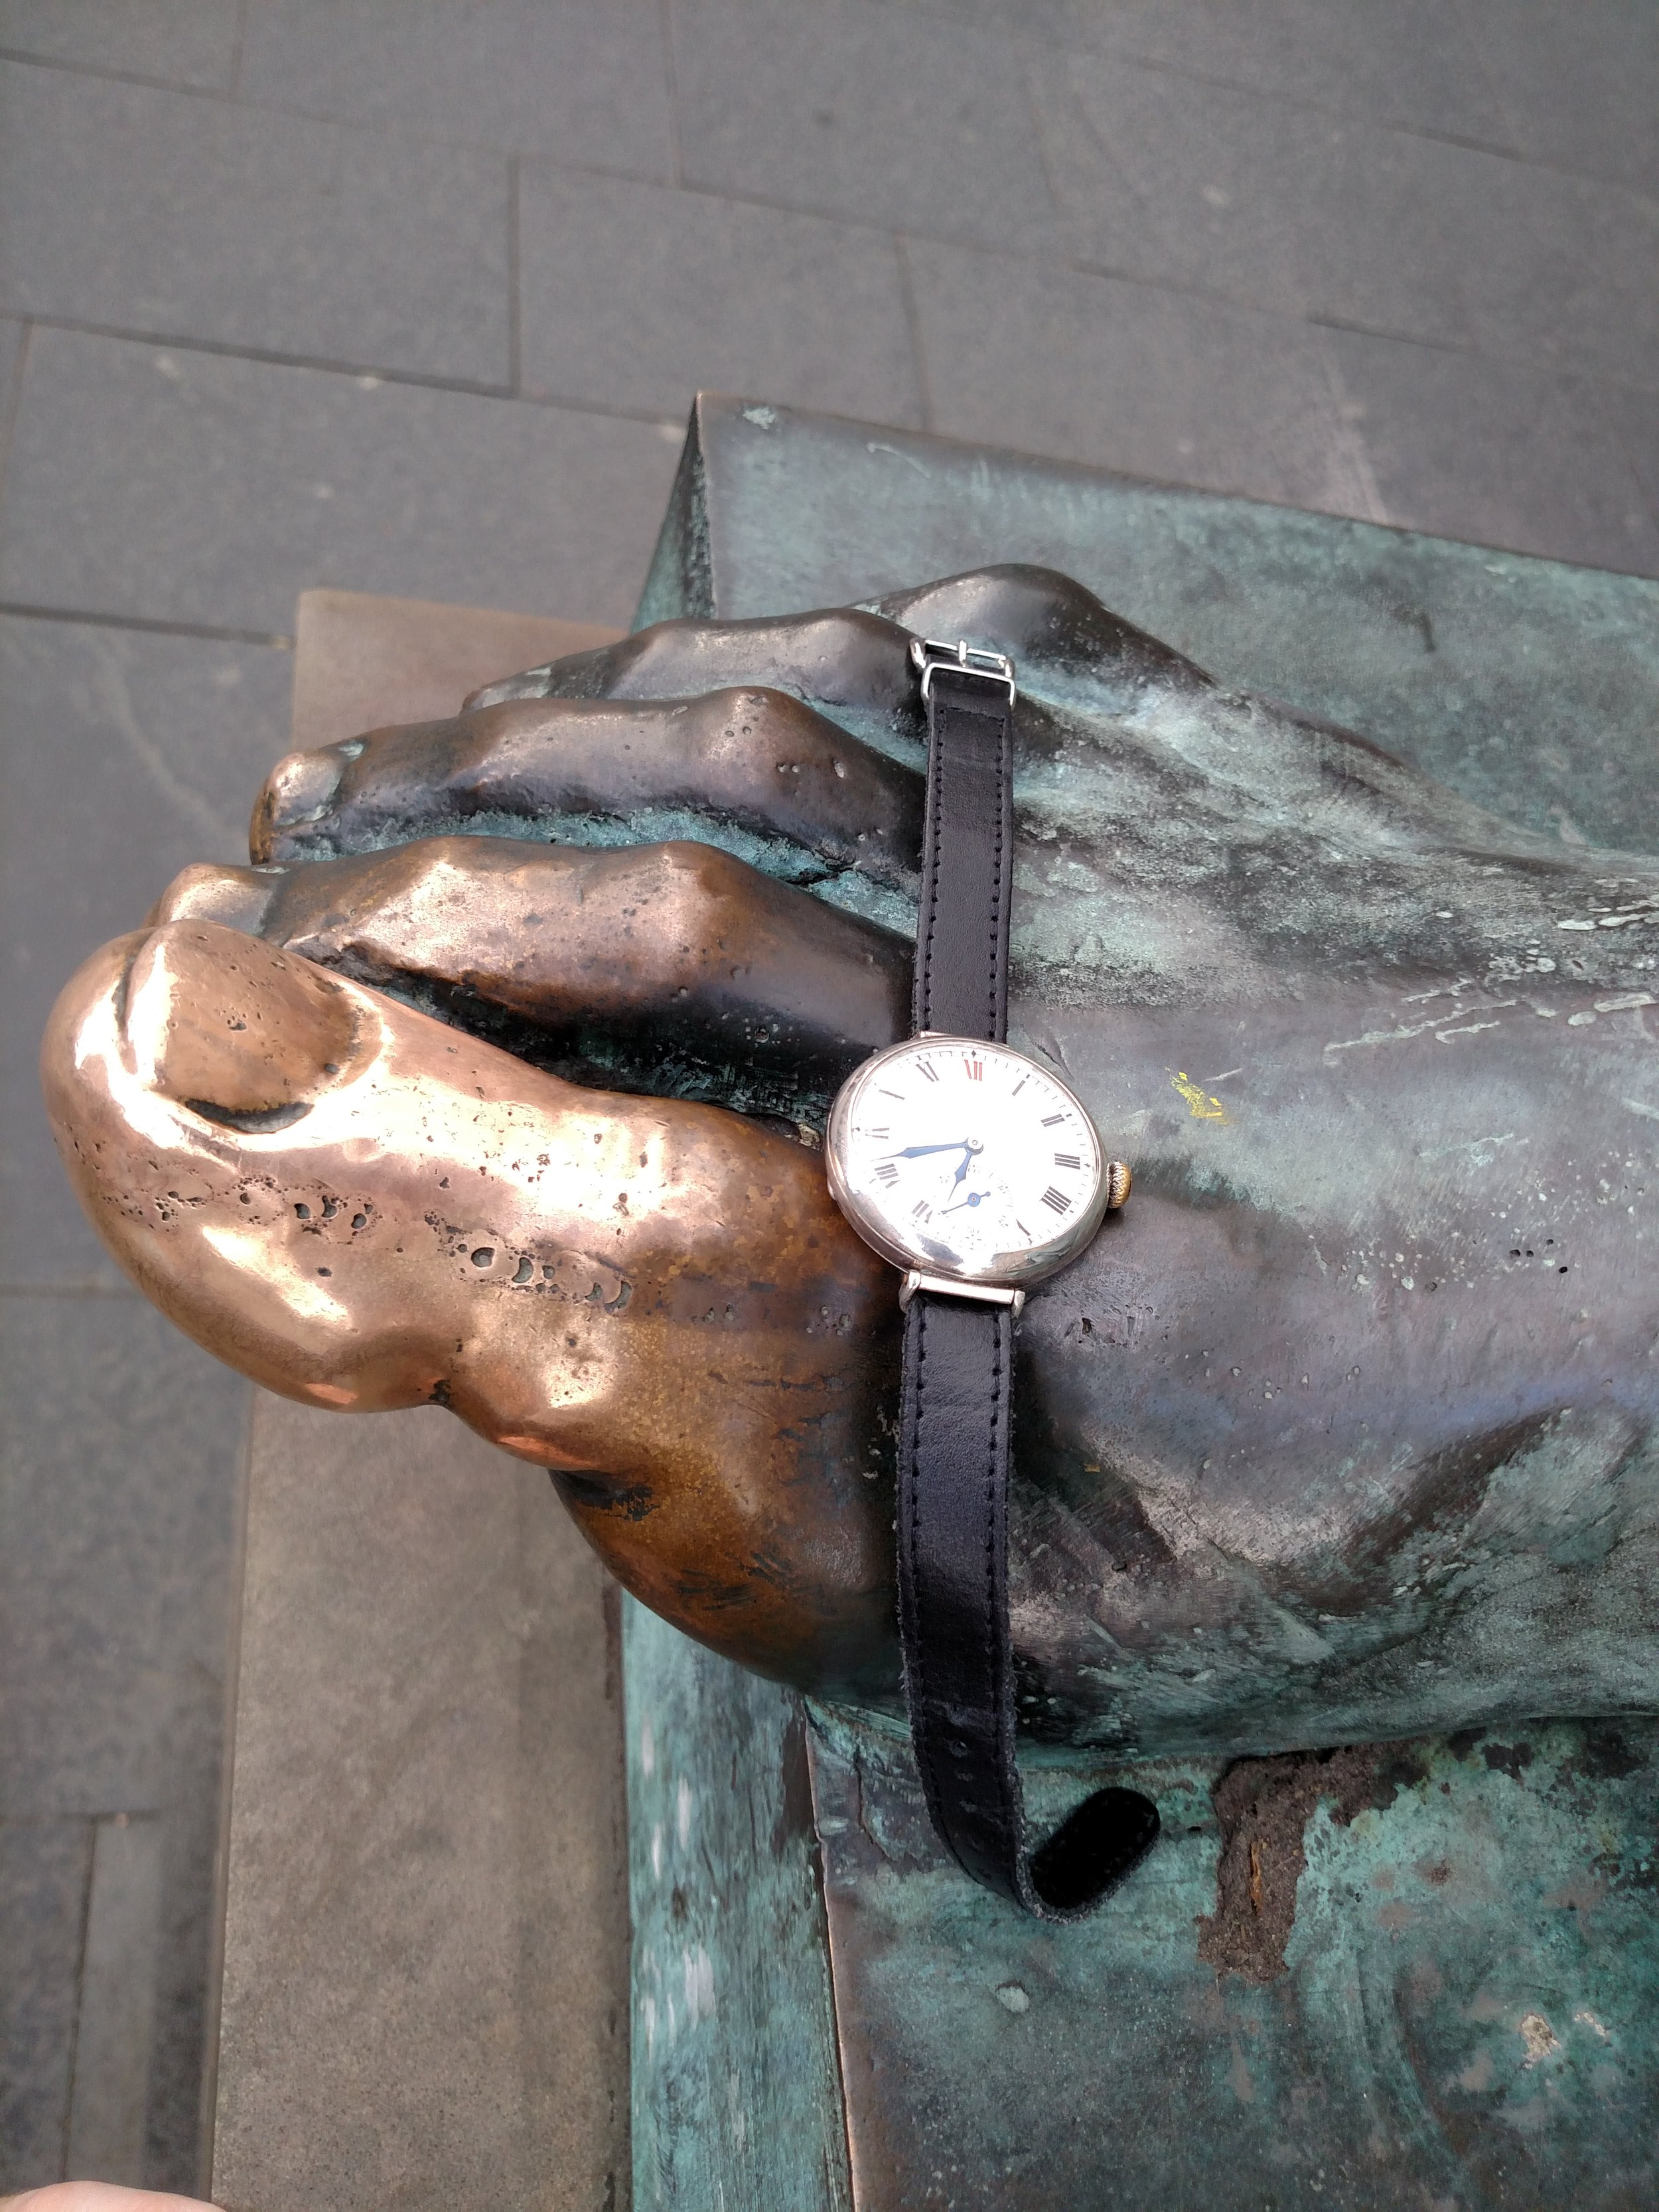 1923 Longines on the toe of David Hume's statue  The Royal Mile, Edinburgh, Scotland